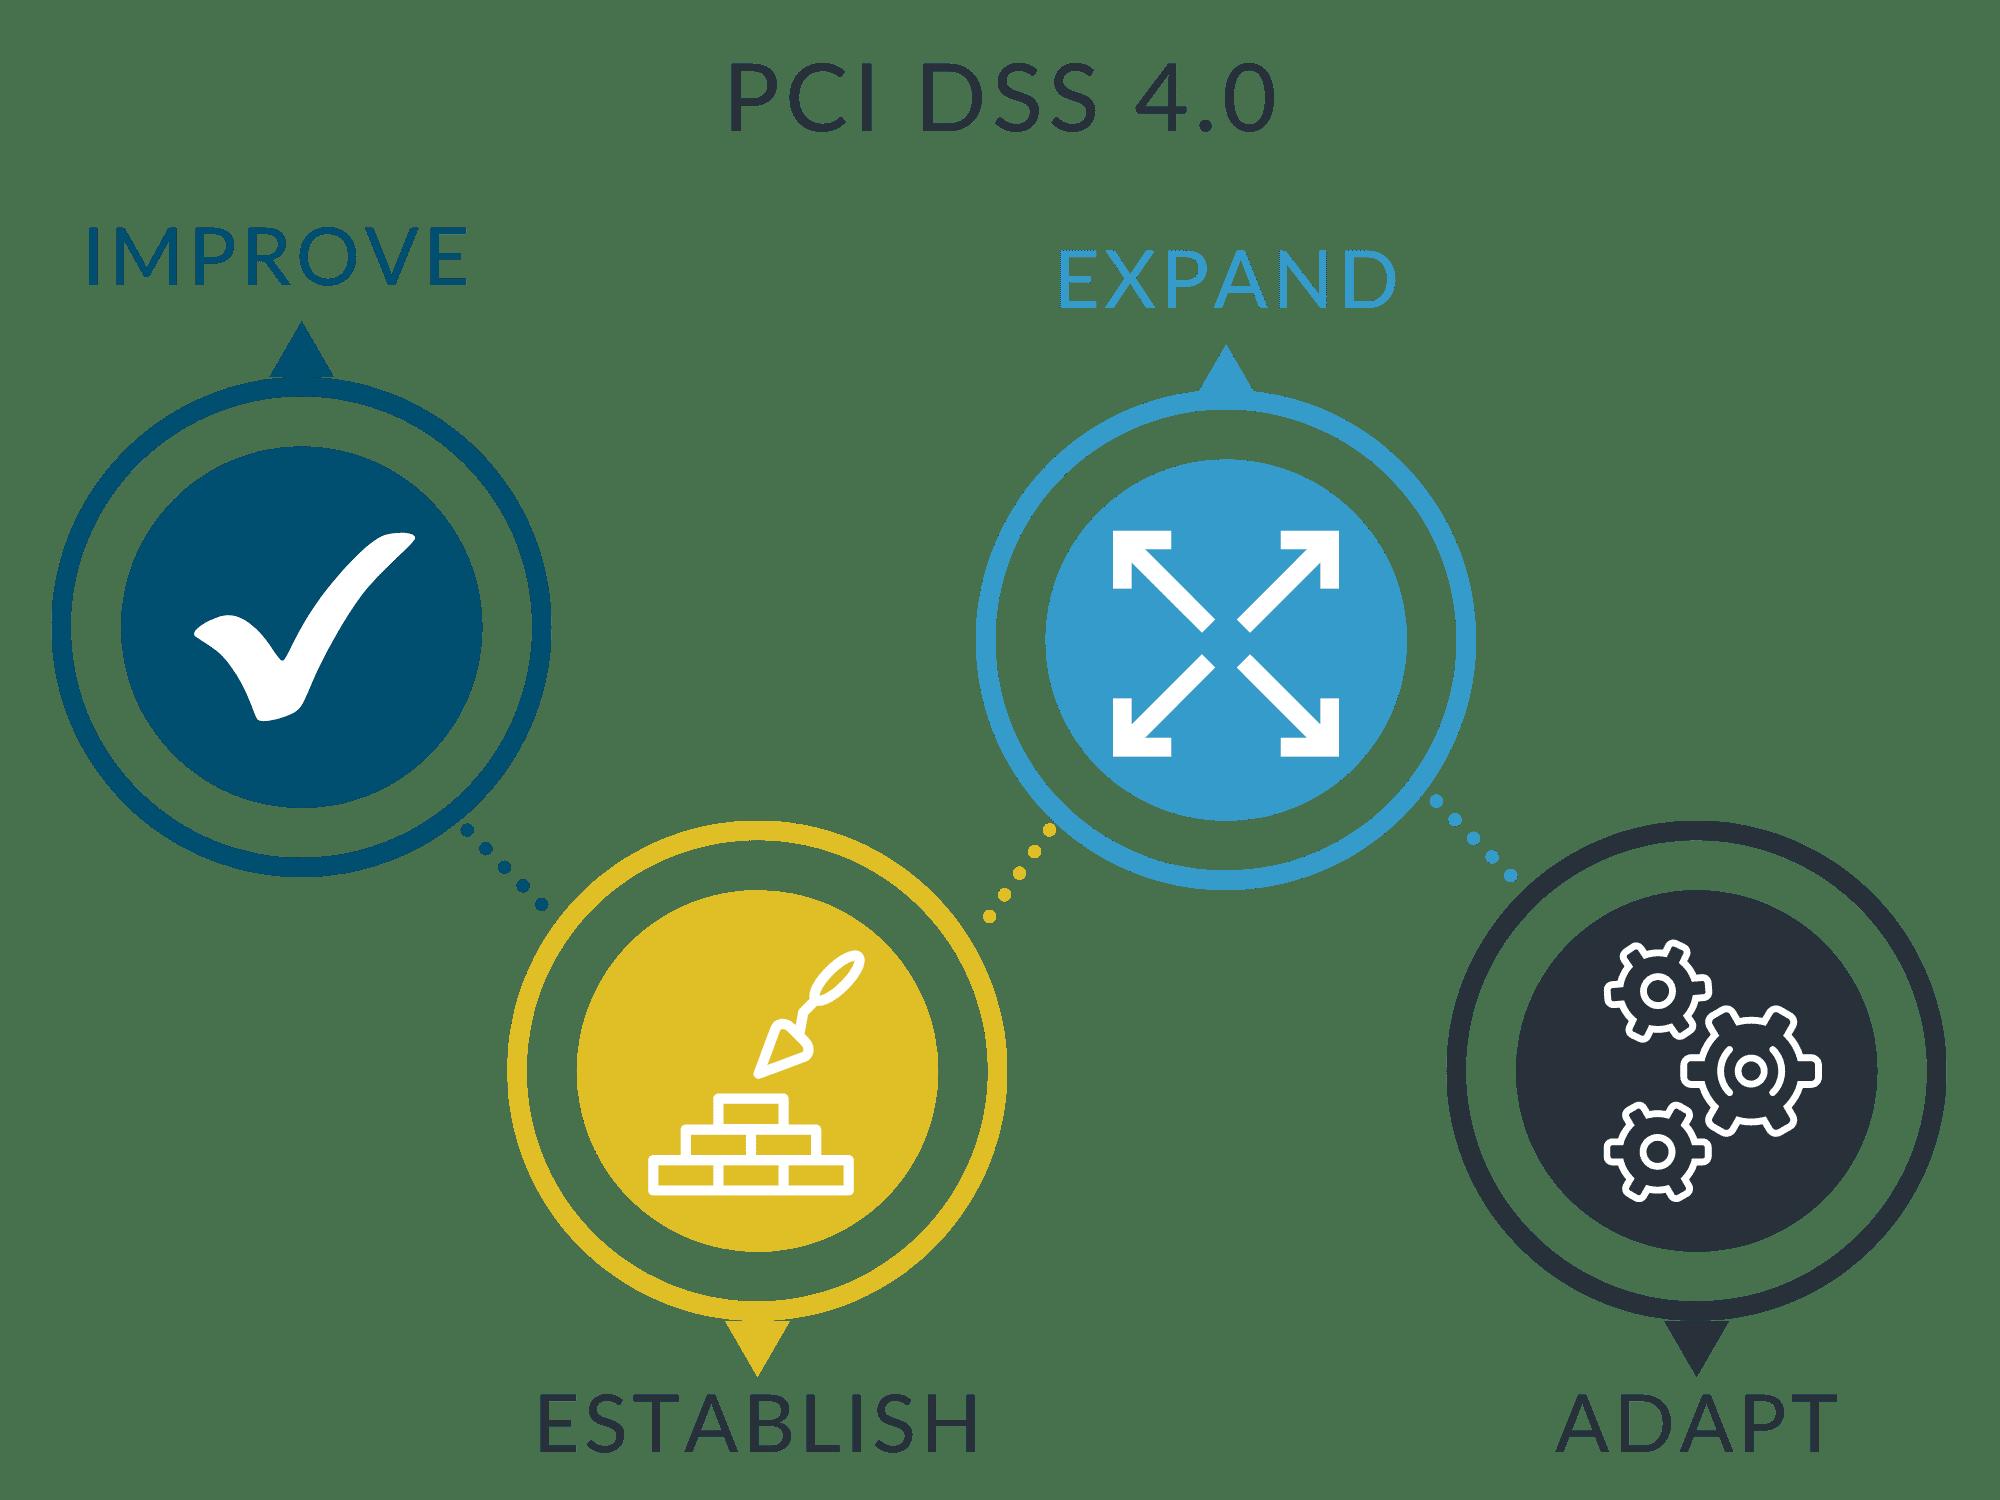 pci-dss-4.0